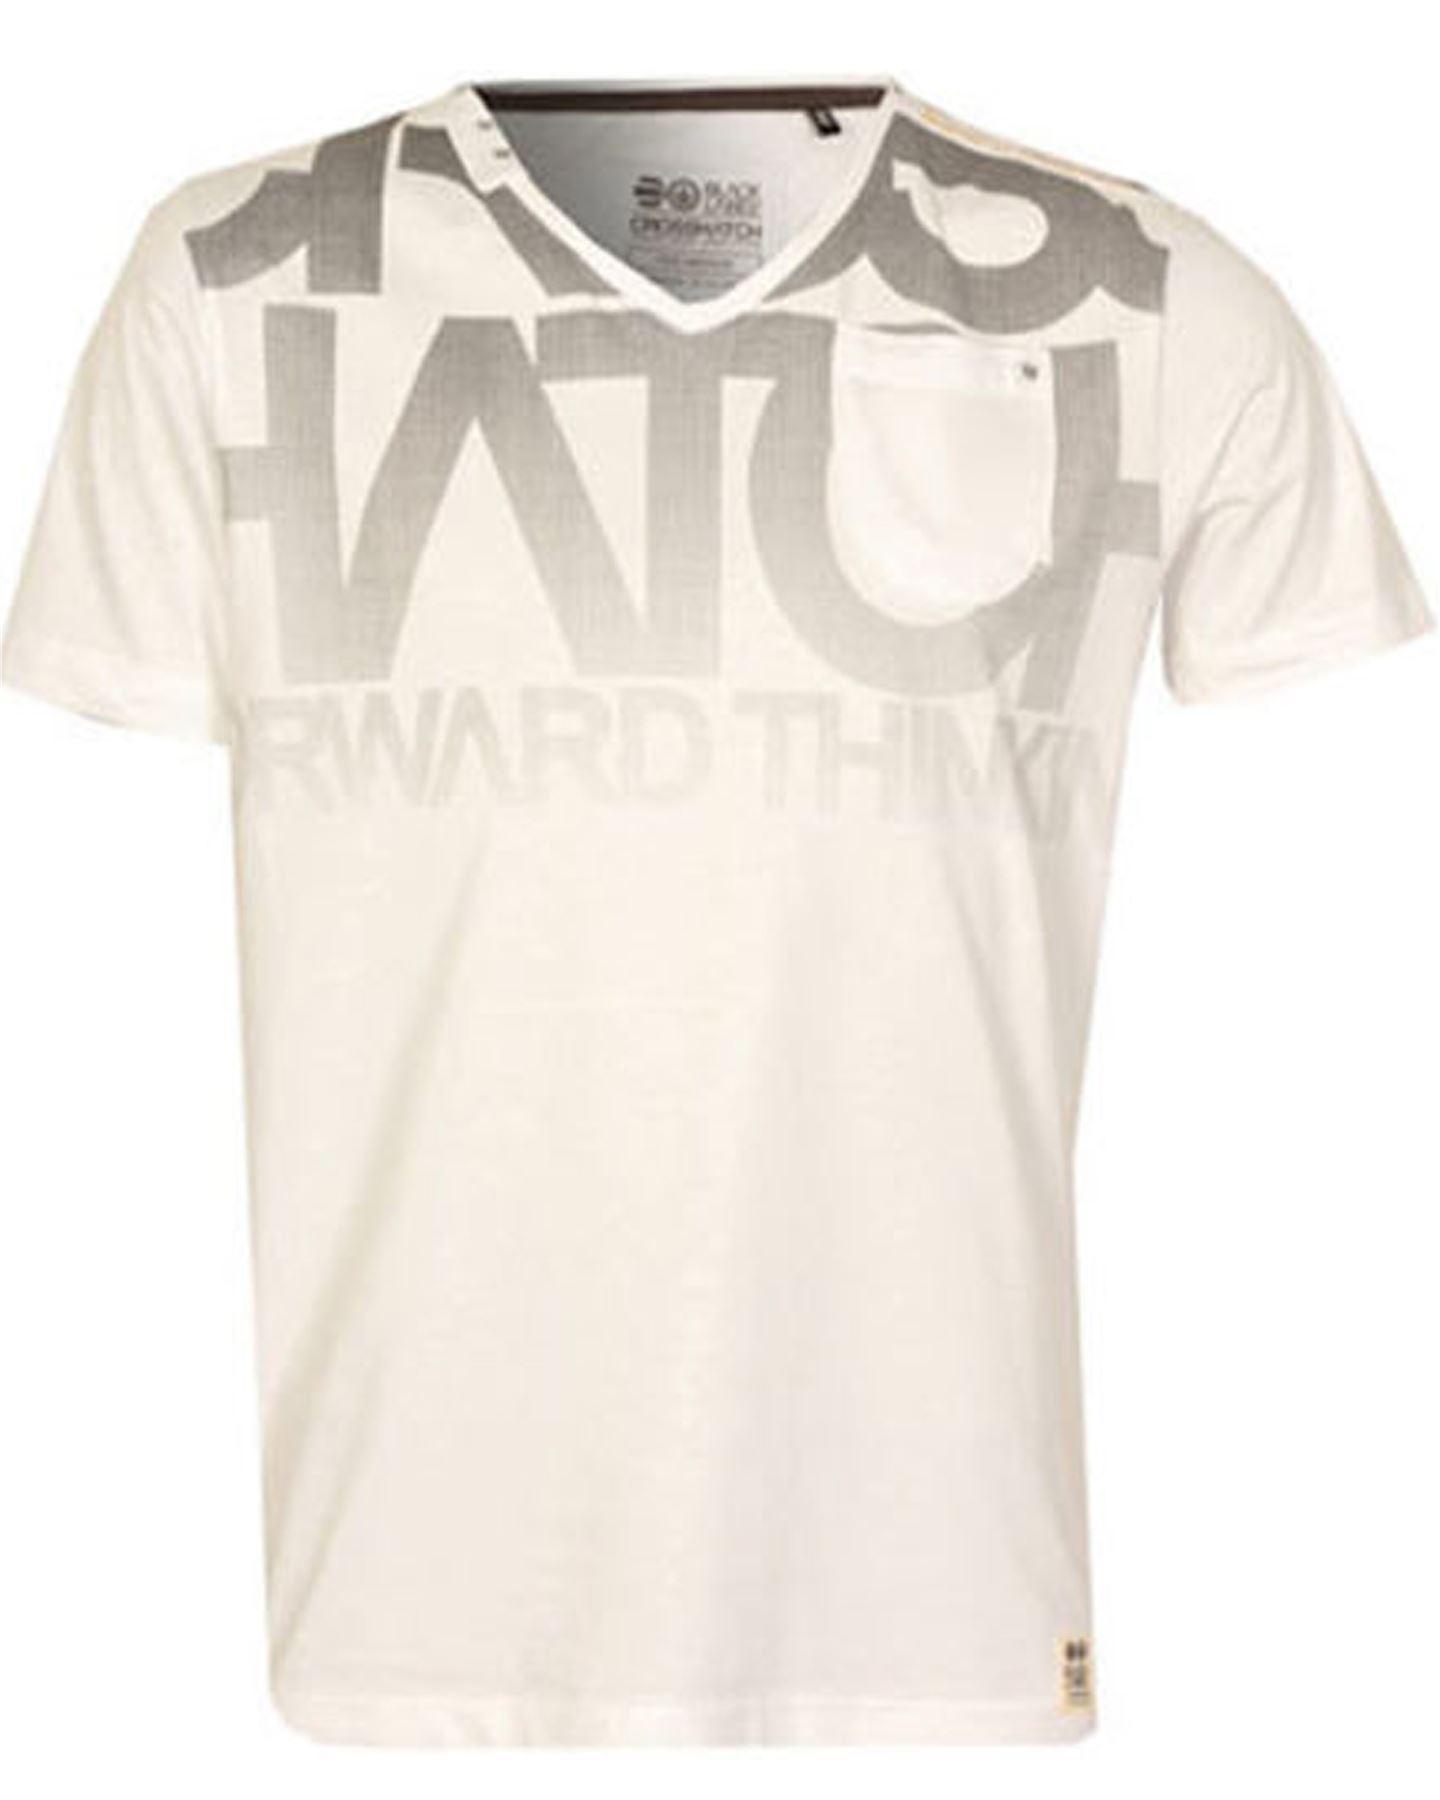 BNWT Mens Crosshatch Graphic 'LAMONTE' V Neck T-shirt Grey BLue White S-XXL